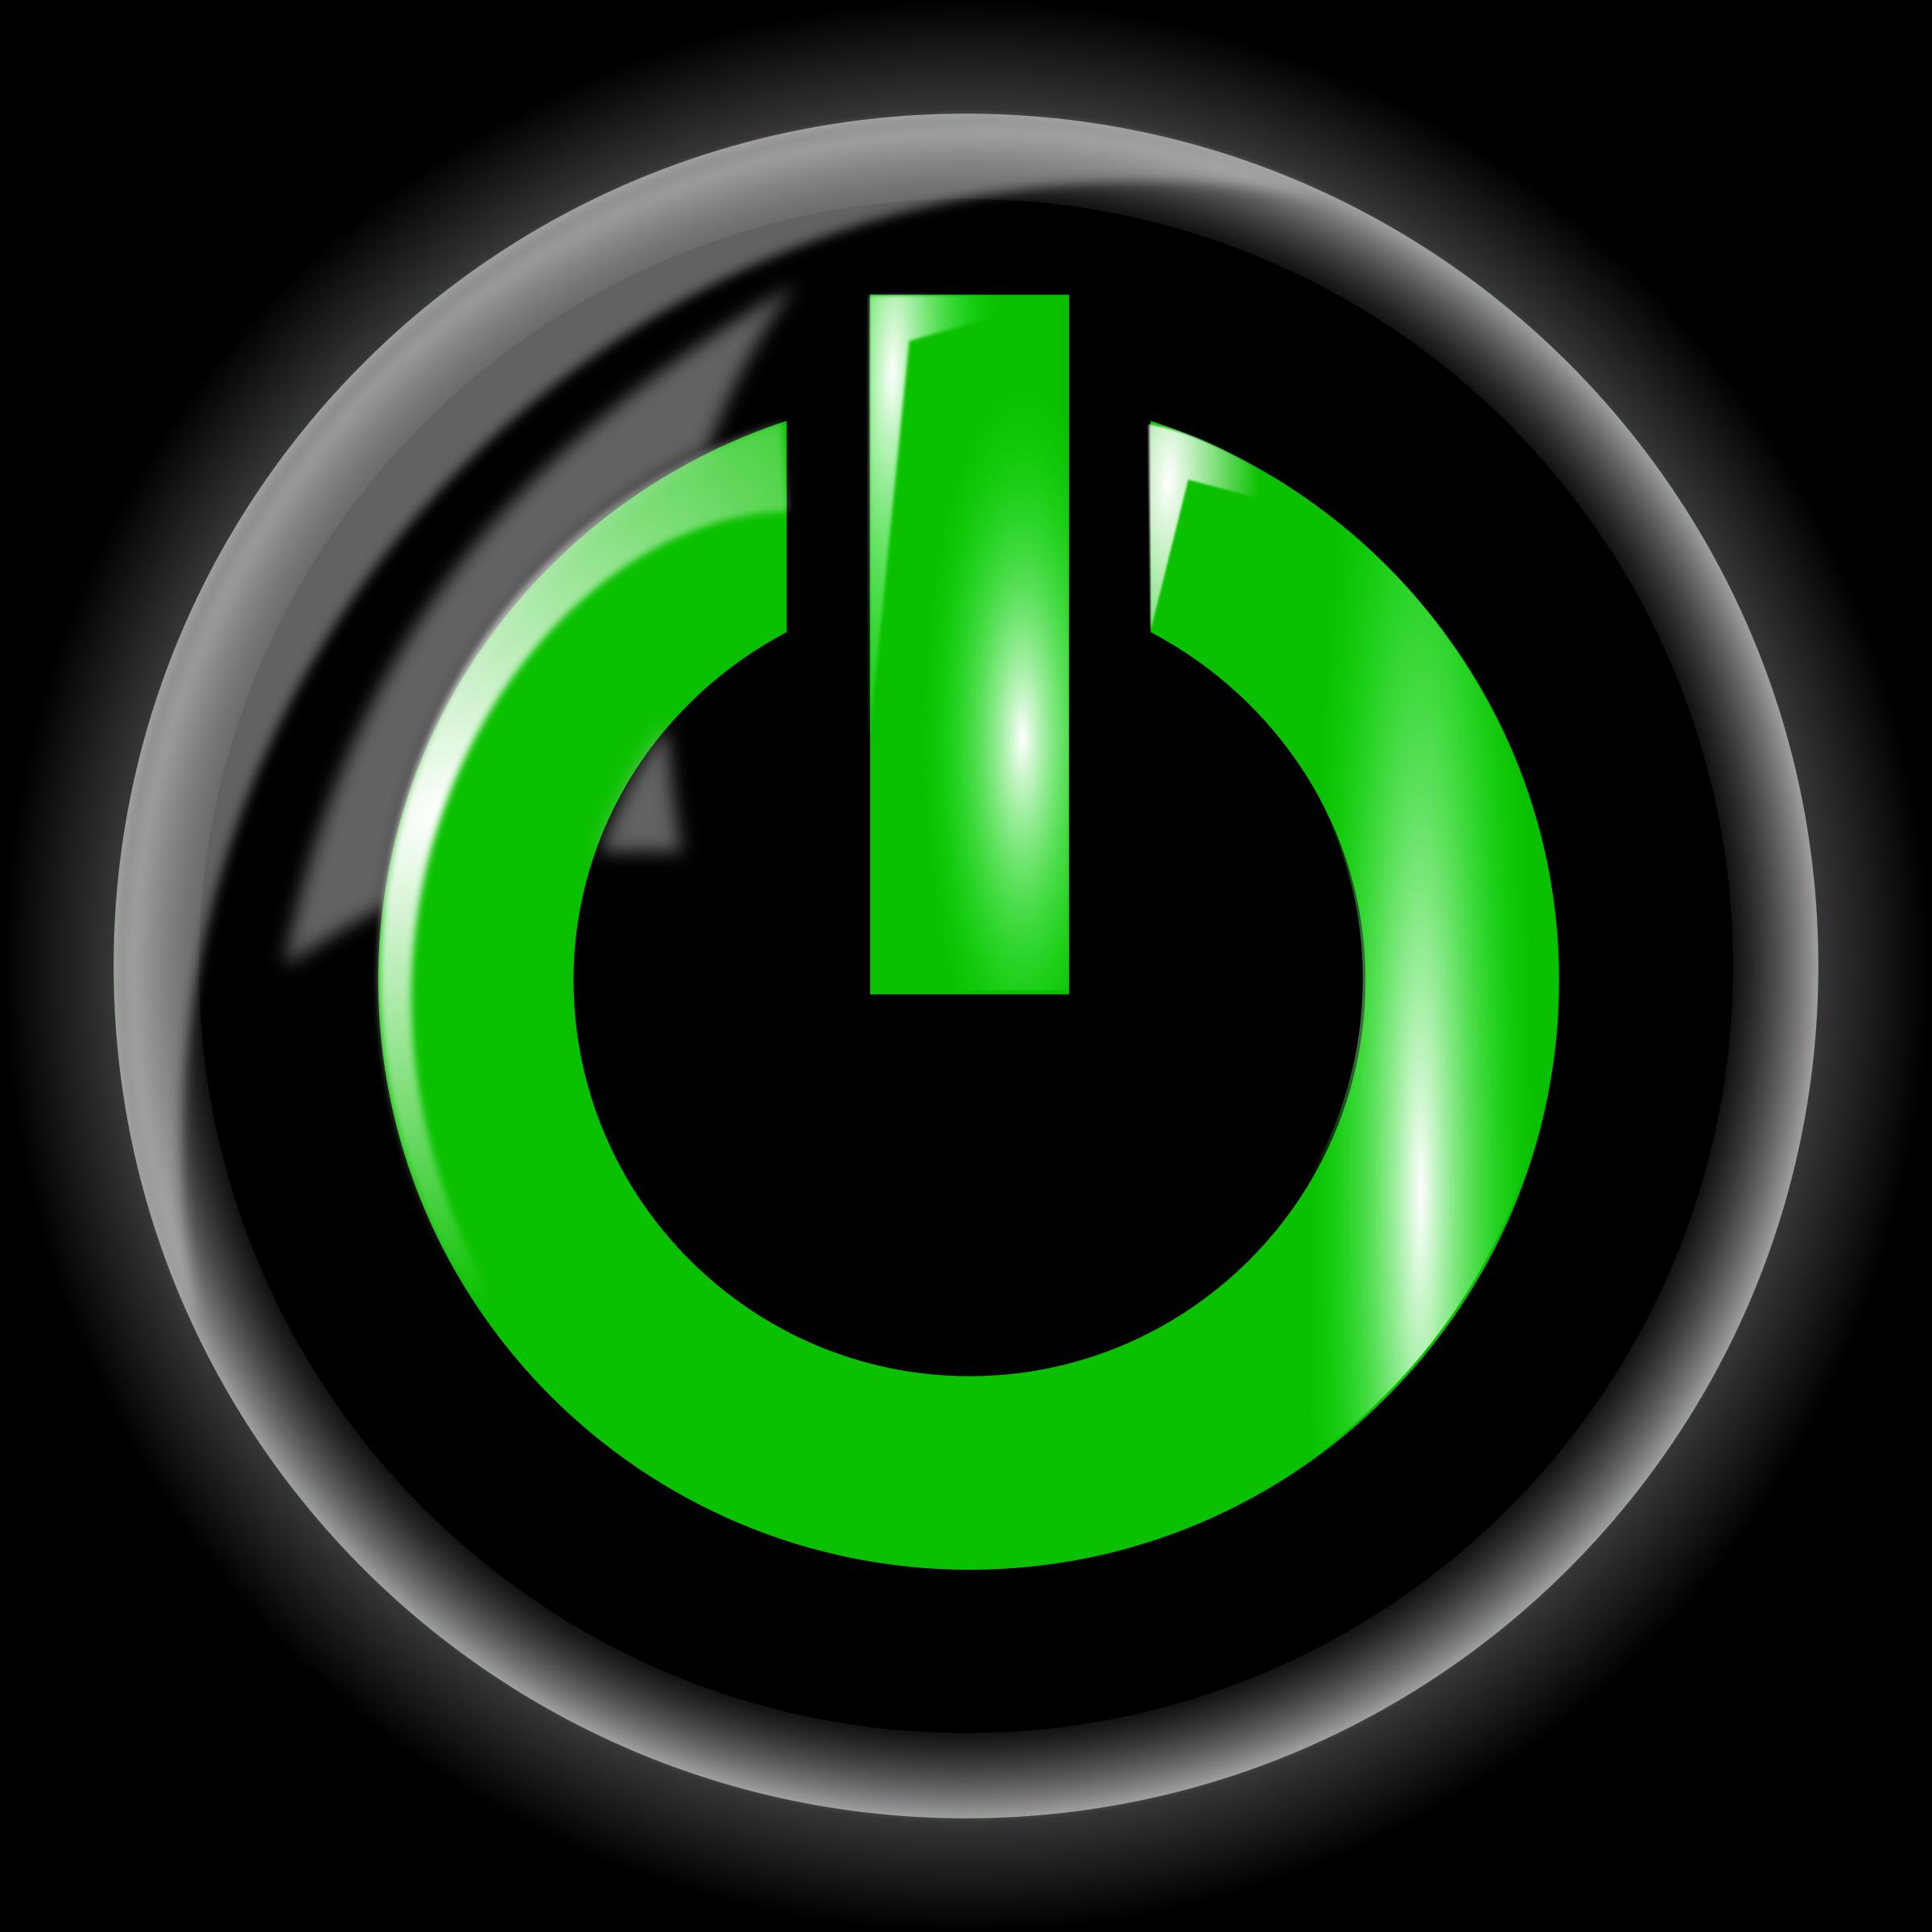 Button clipart power. Black big image png